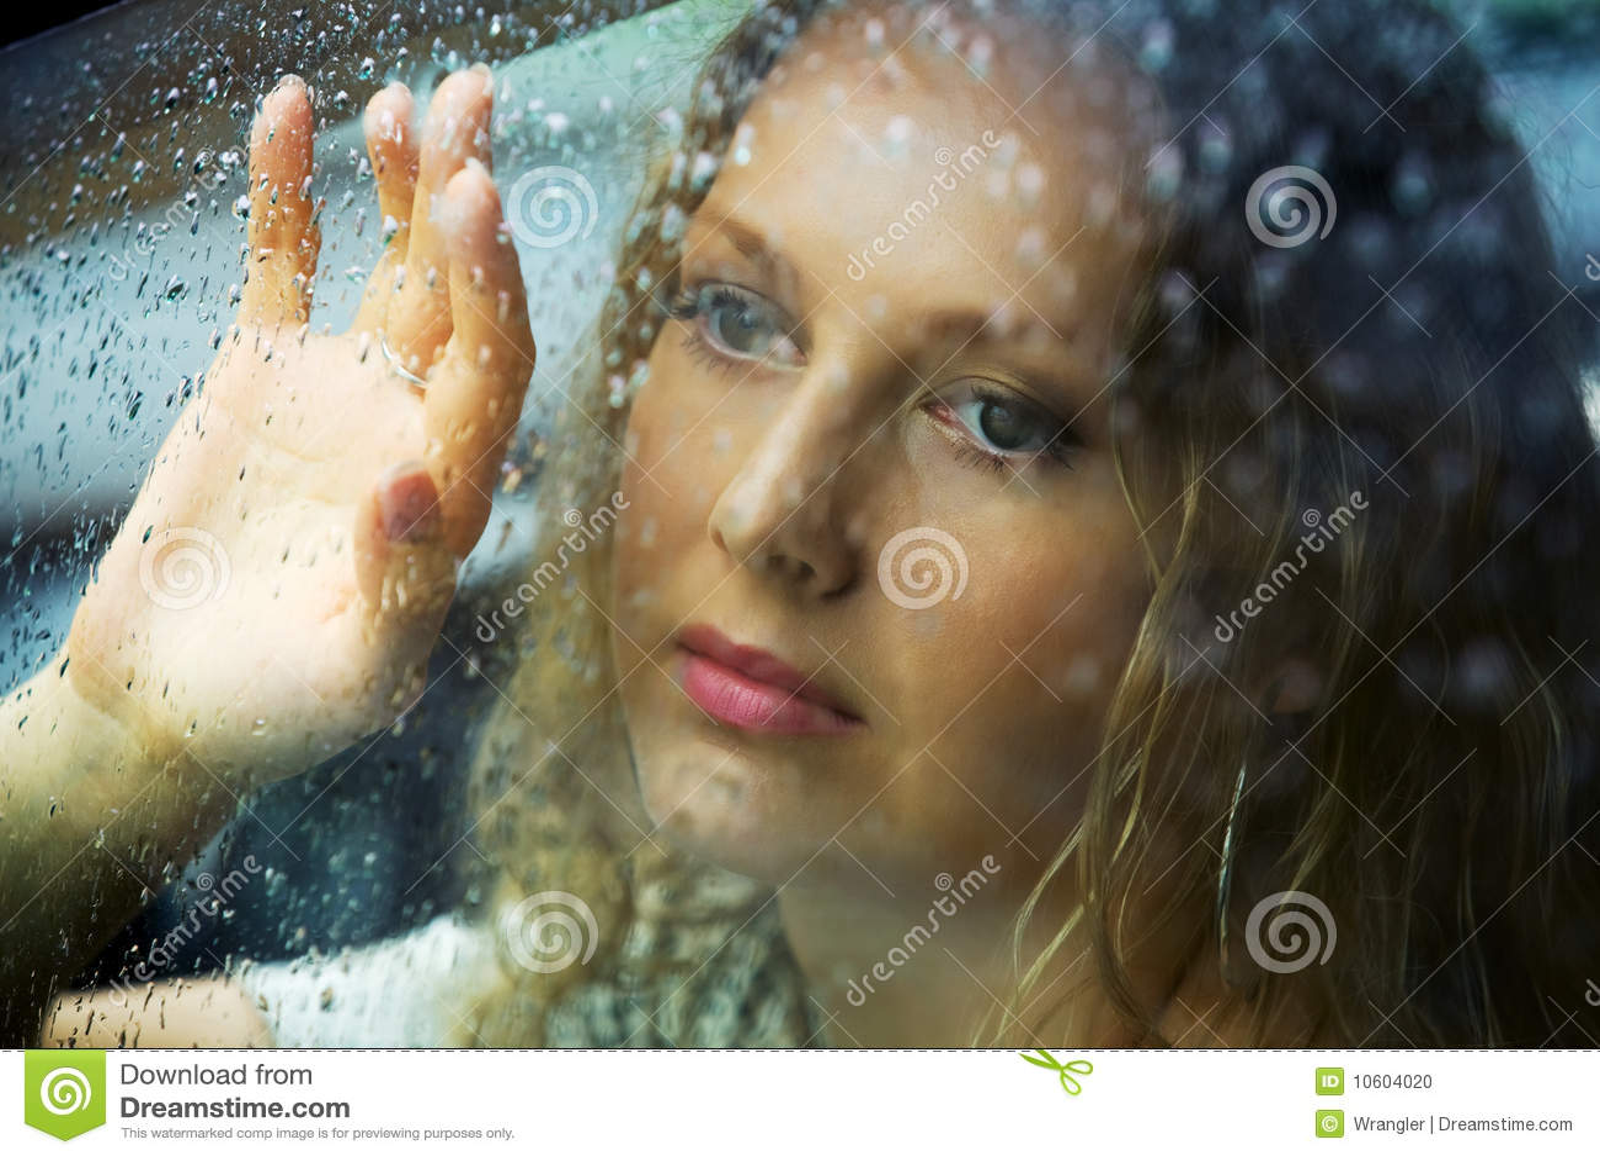 Sad woman and a rain stock photo. Image of hand, beauty ...